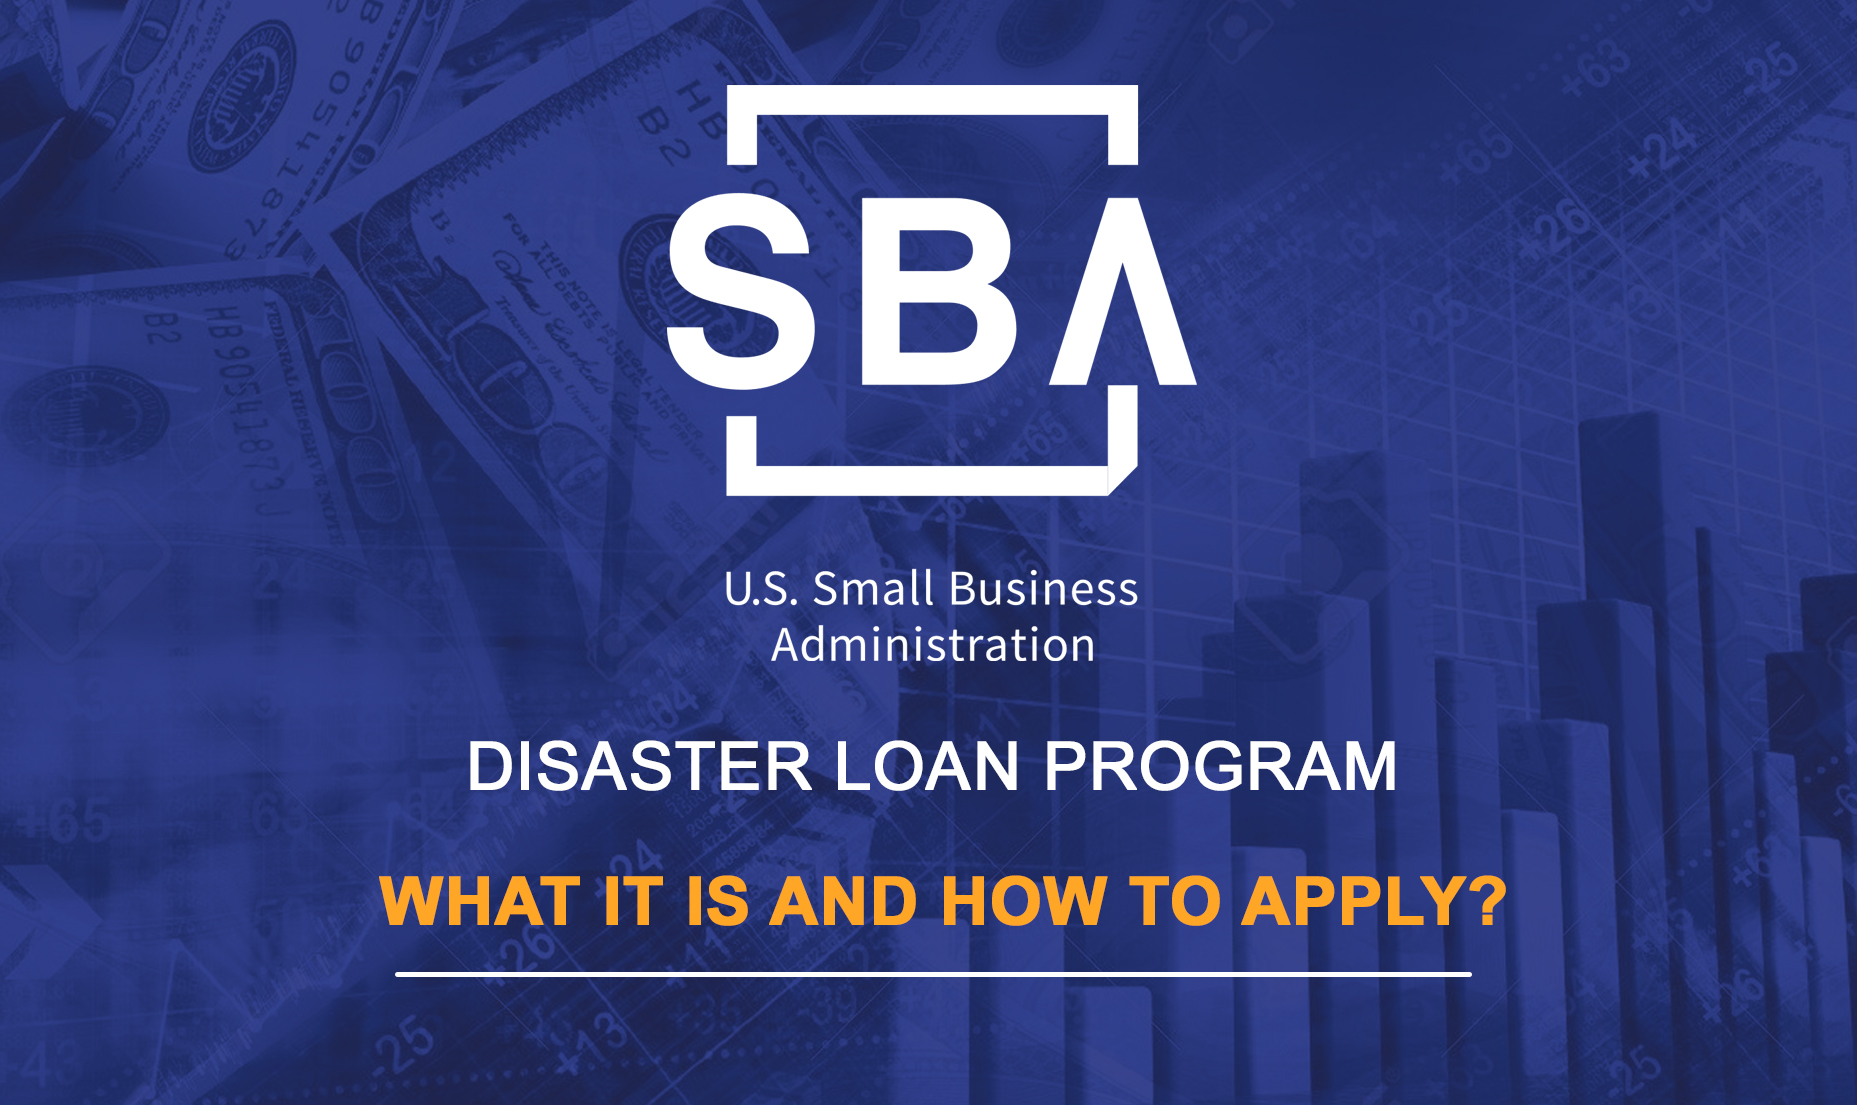 sba-disaster-loan